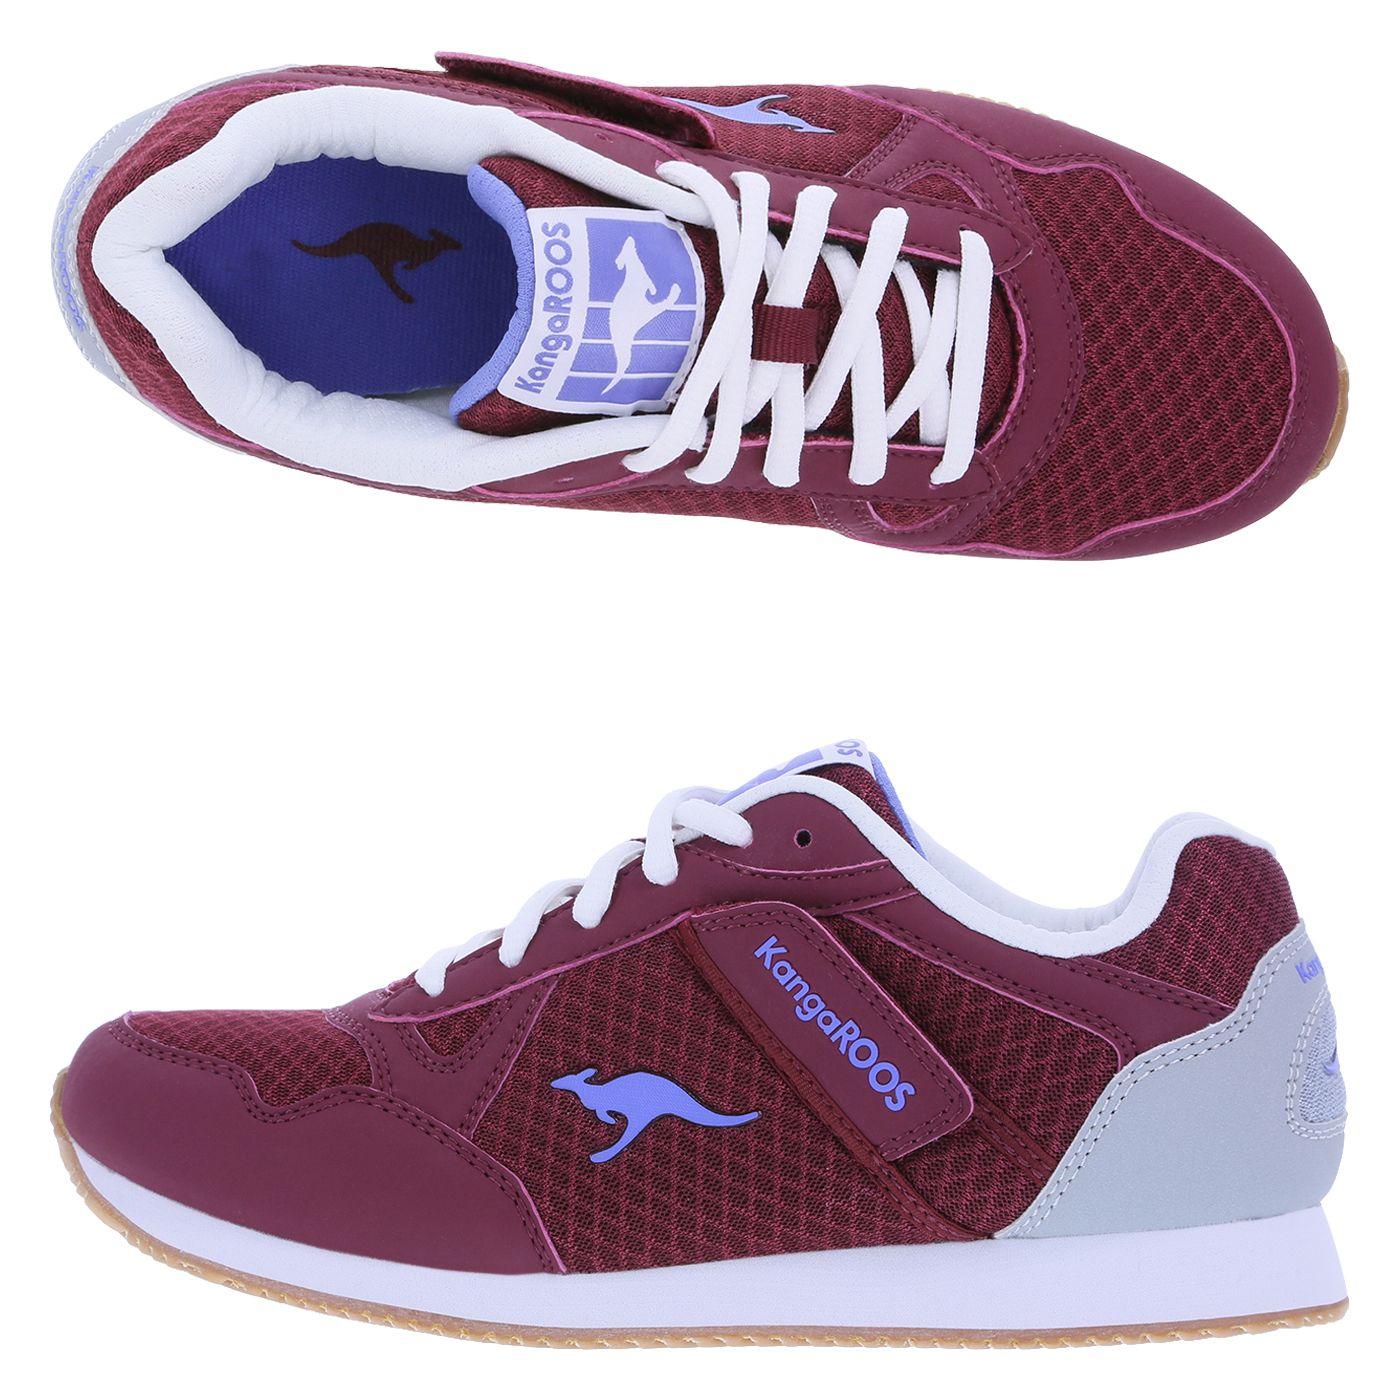 Womens Shaker Jogger My Style Pinterest Shoes Joggers And Eagle Stallion Sepatu Jogging Grey Beige 41 Maroon Kangaroo Friendly Girls Sneakers